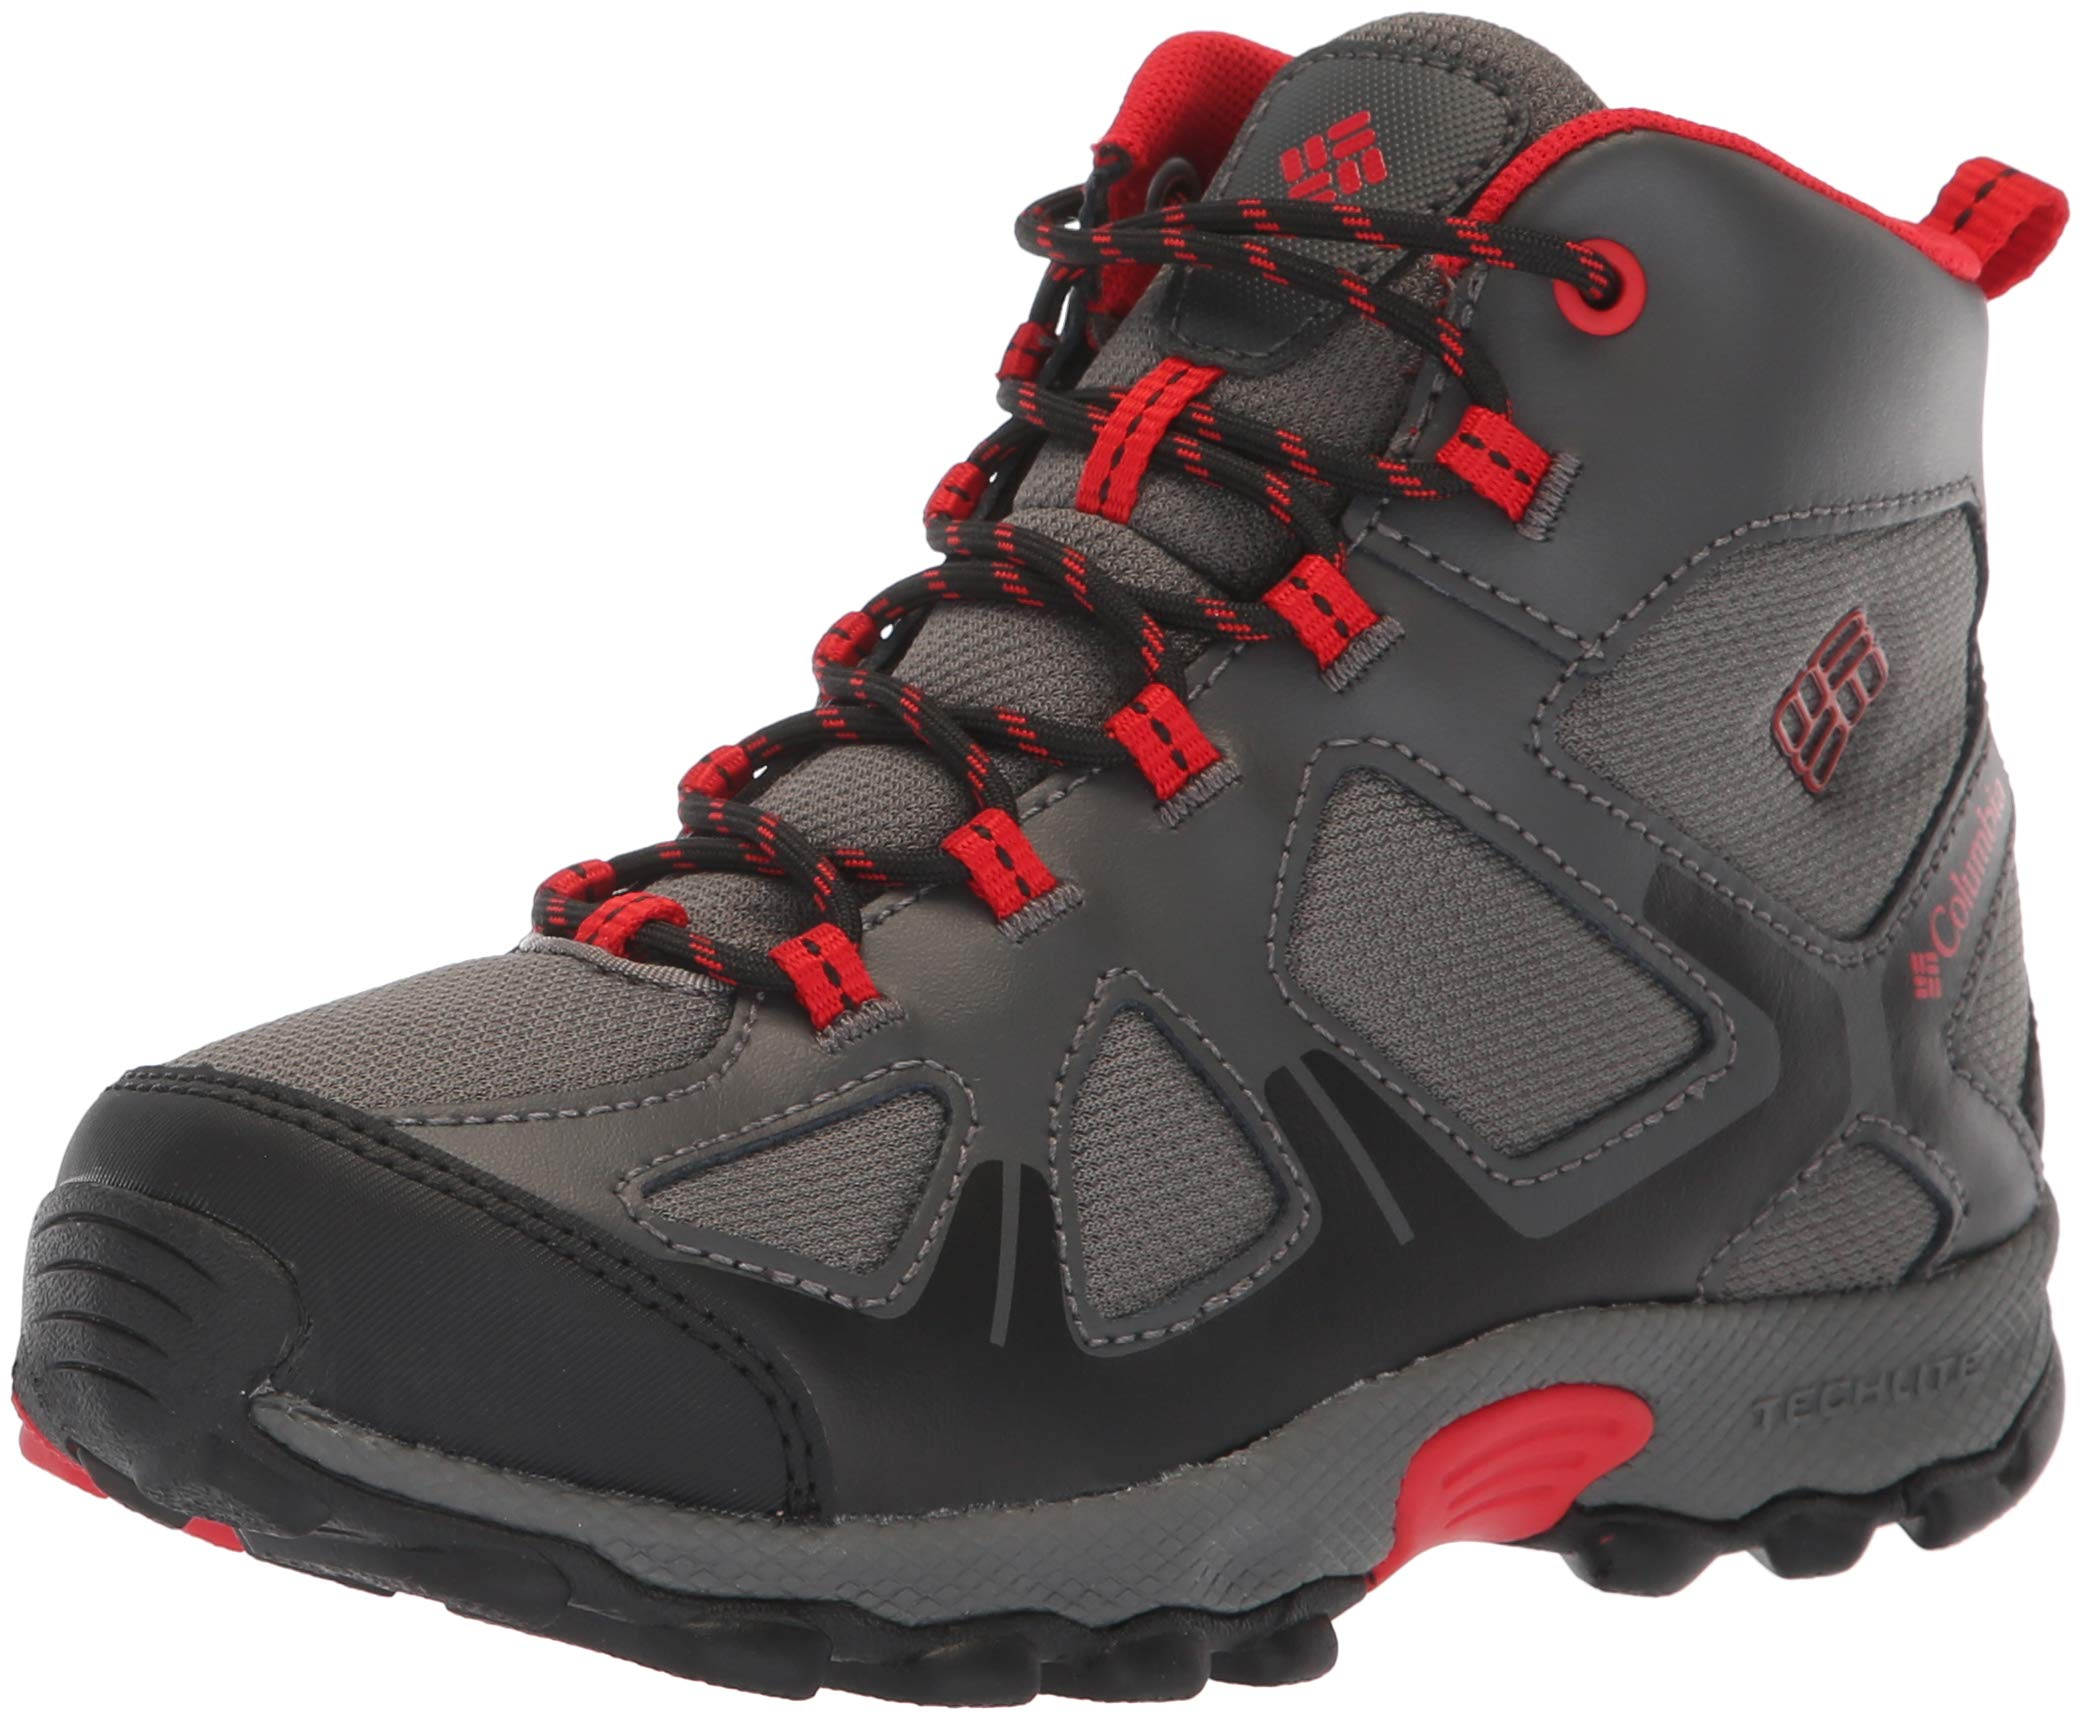 Columbia Boys' Youth Peakfreak XCRSN MID Waterproof Hiking Shoe, City Grey, Bright red, 1 Regular US Little Kid